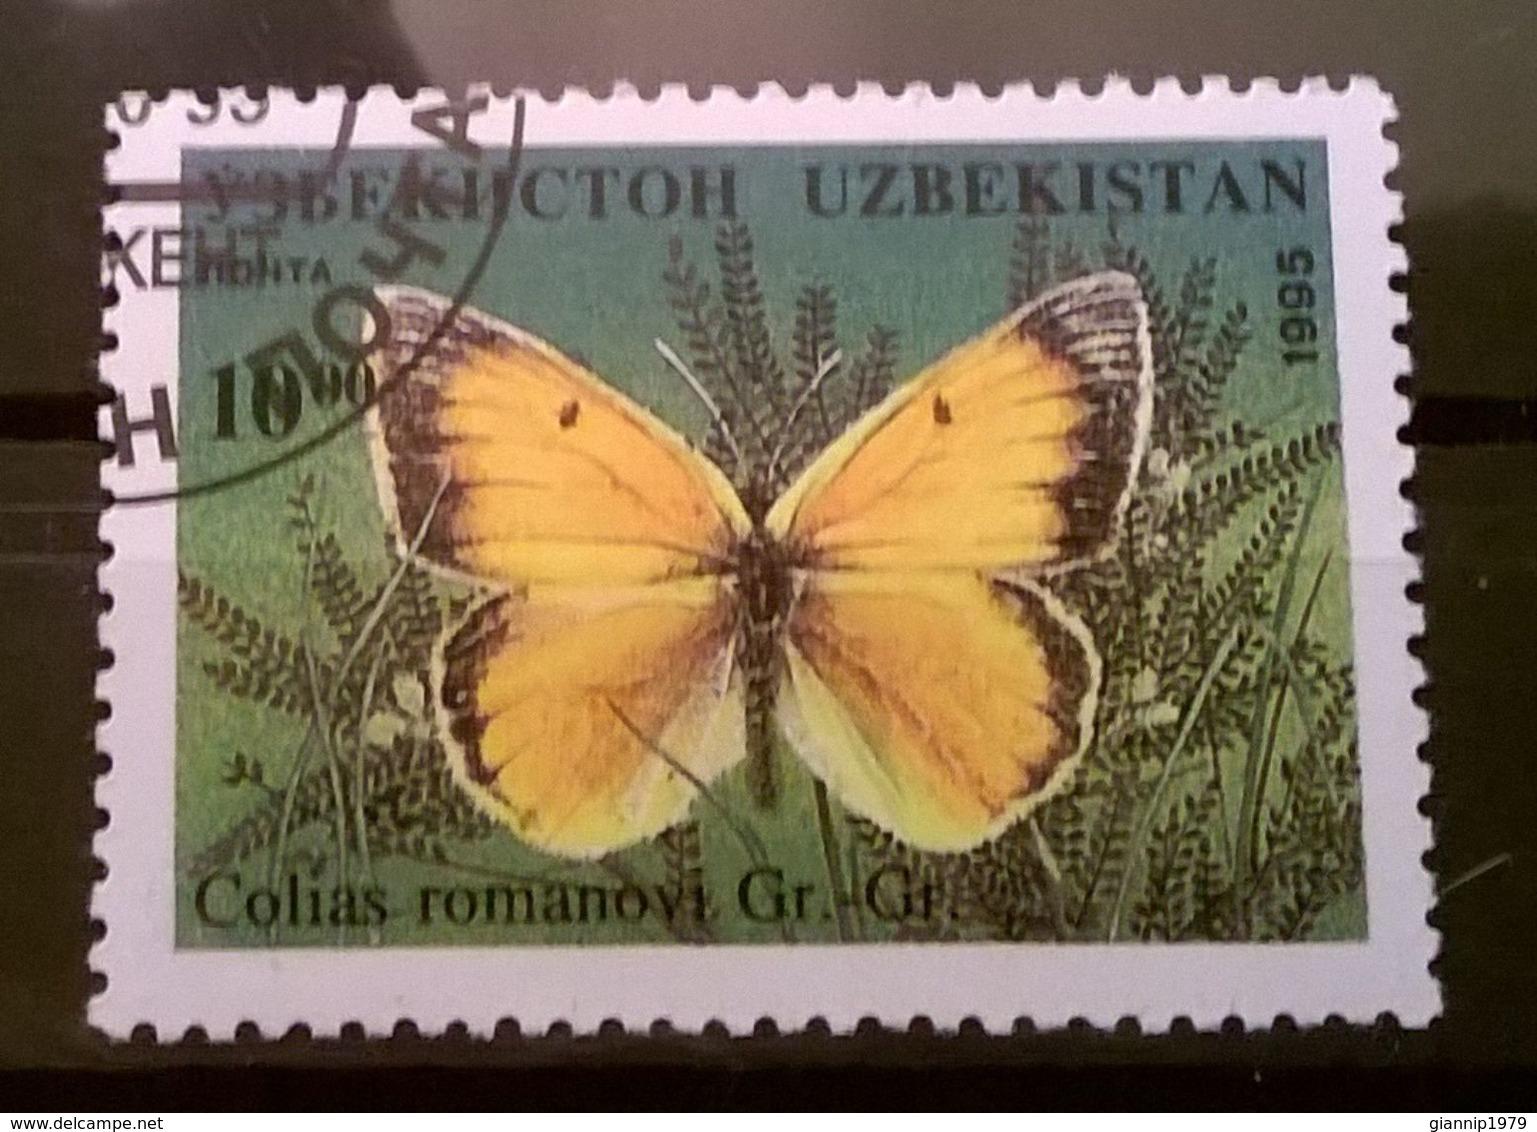 FRANCOBOLLI STAMPS UZBEKISTAN 1995 SERIE FARFALLE NOTTURNE - Uzbekistan